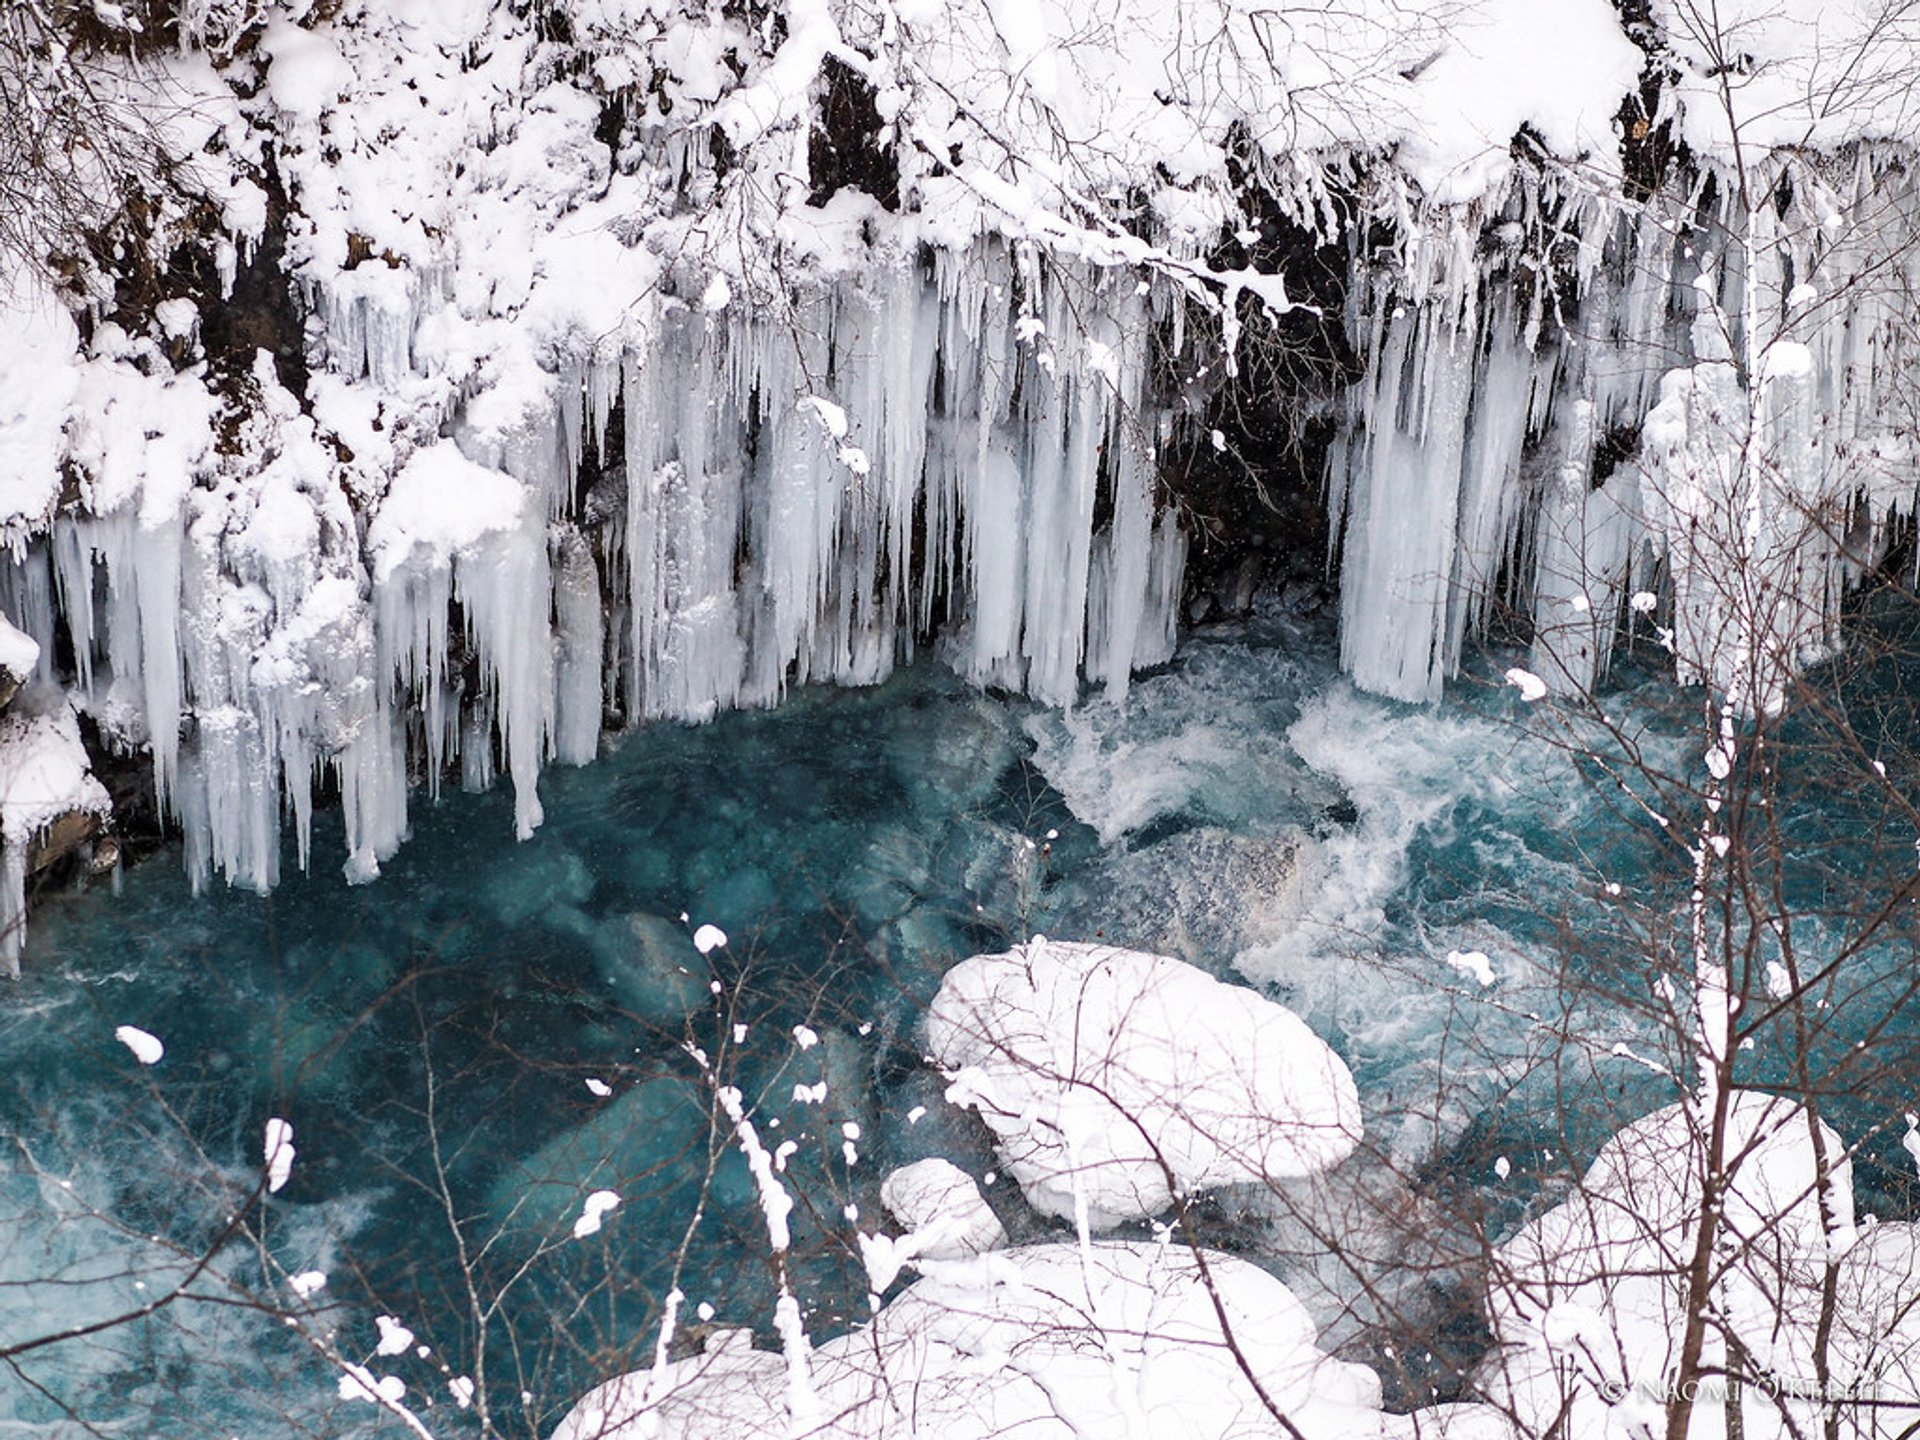 Blue River at Shirogane Onsen (Hot Spring), Biei, Hokkaido 2020